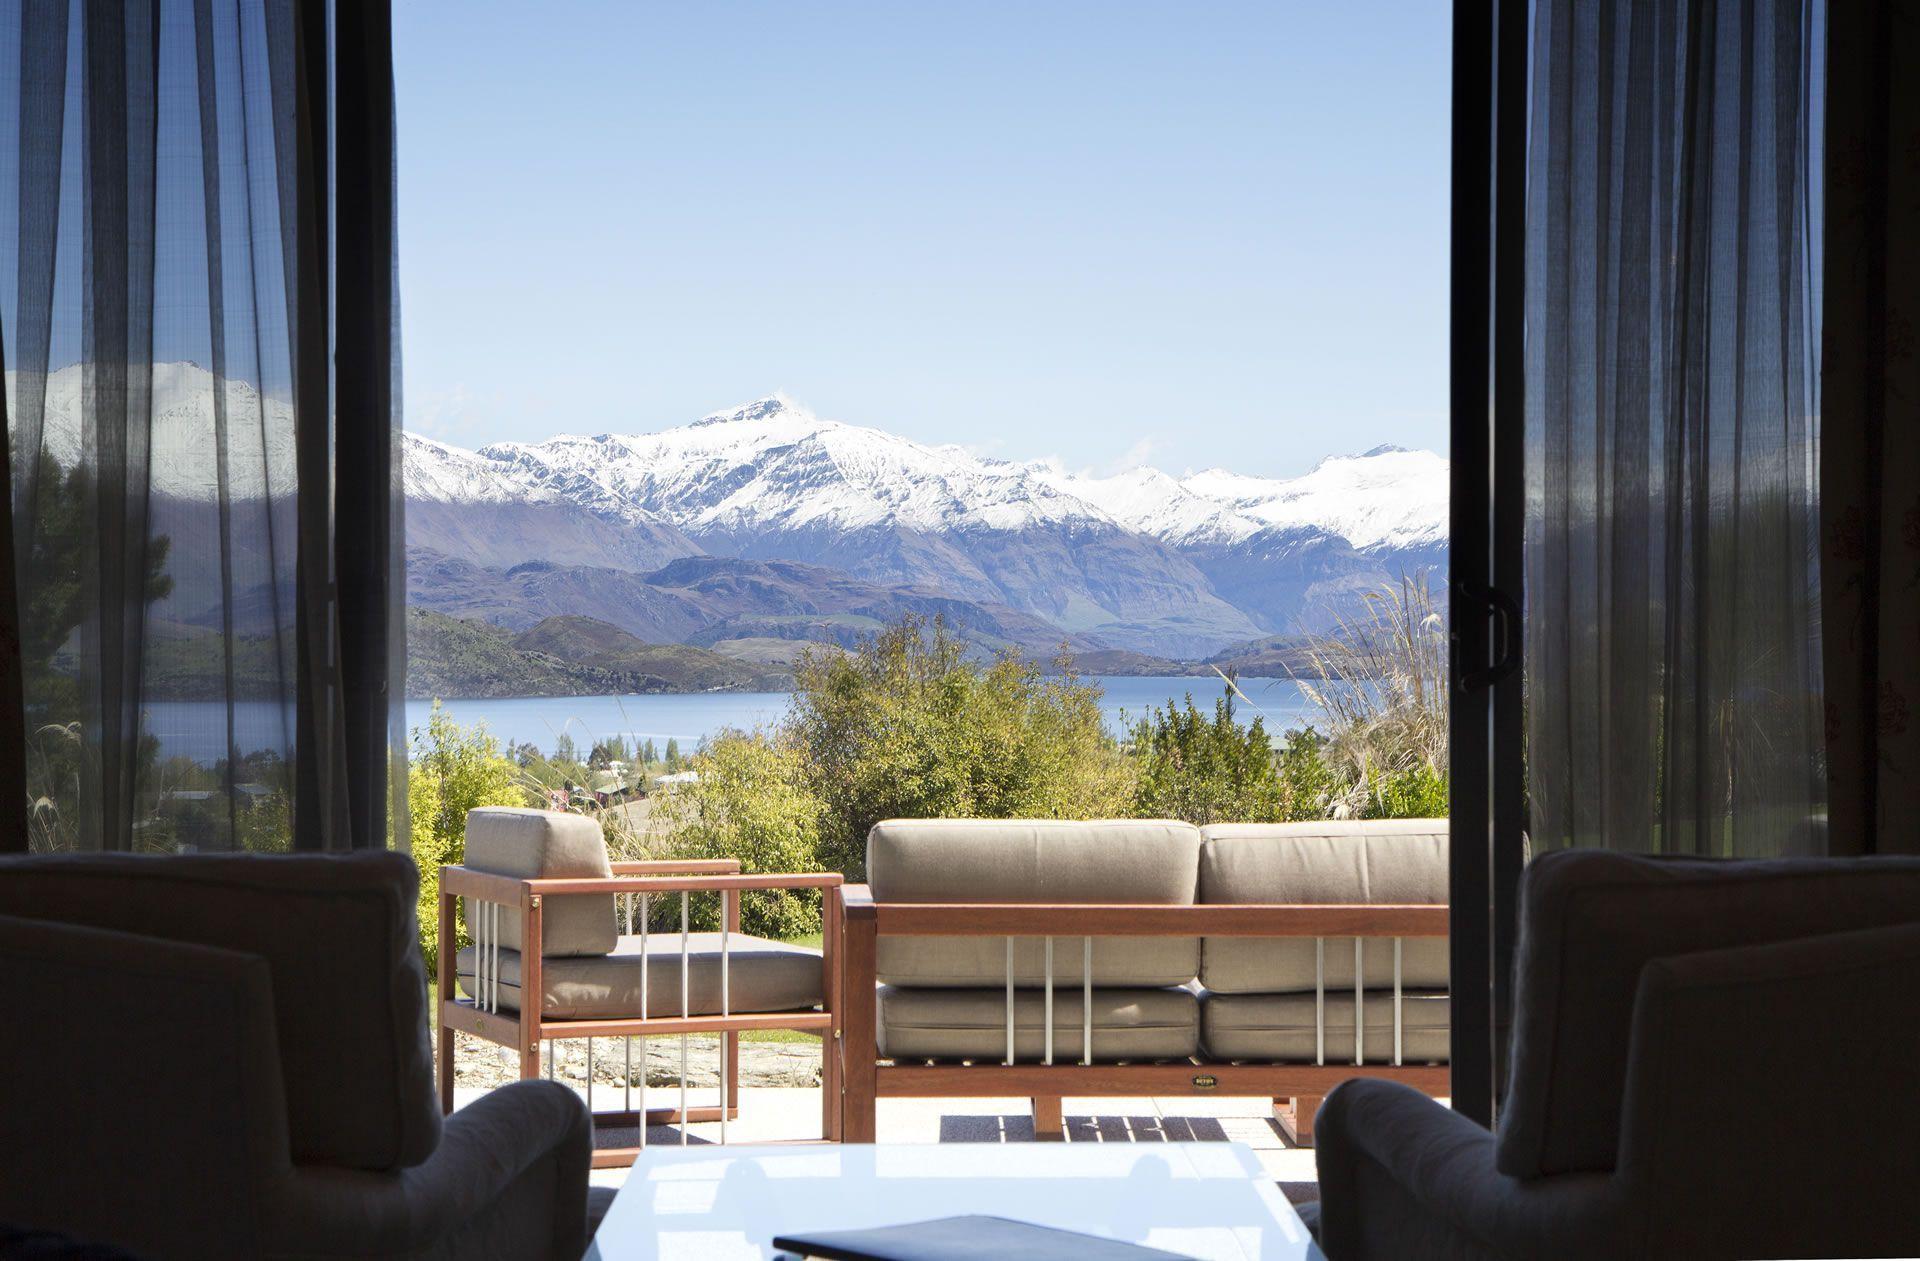 Mabey Ski_New Zealand_Wanaka_Tin Tub Lodge (6).jpg